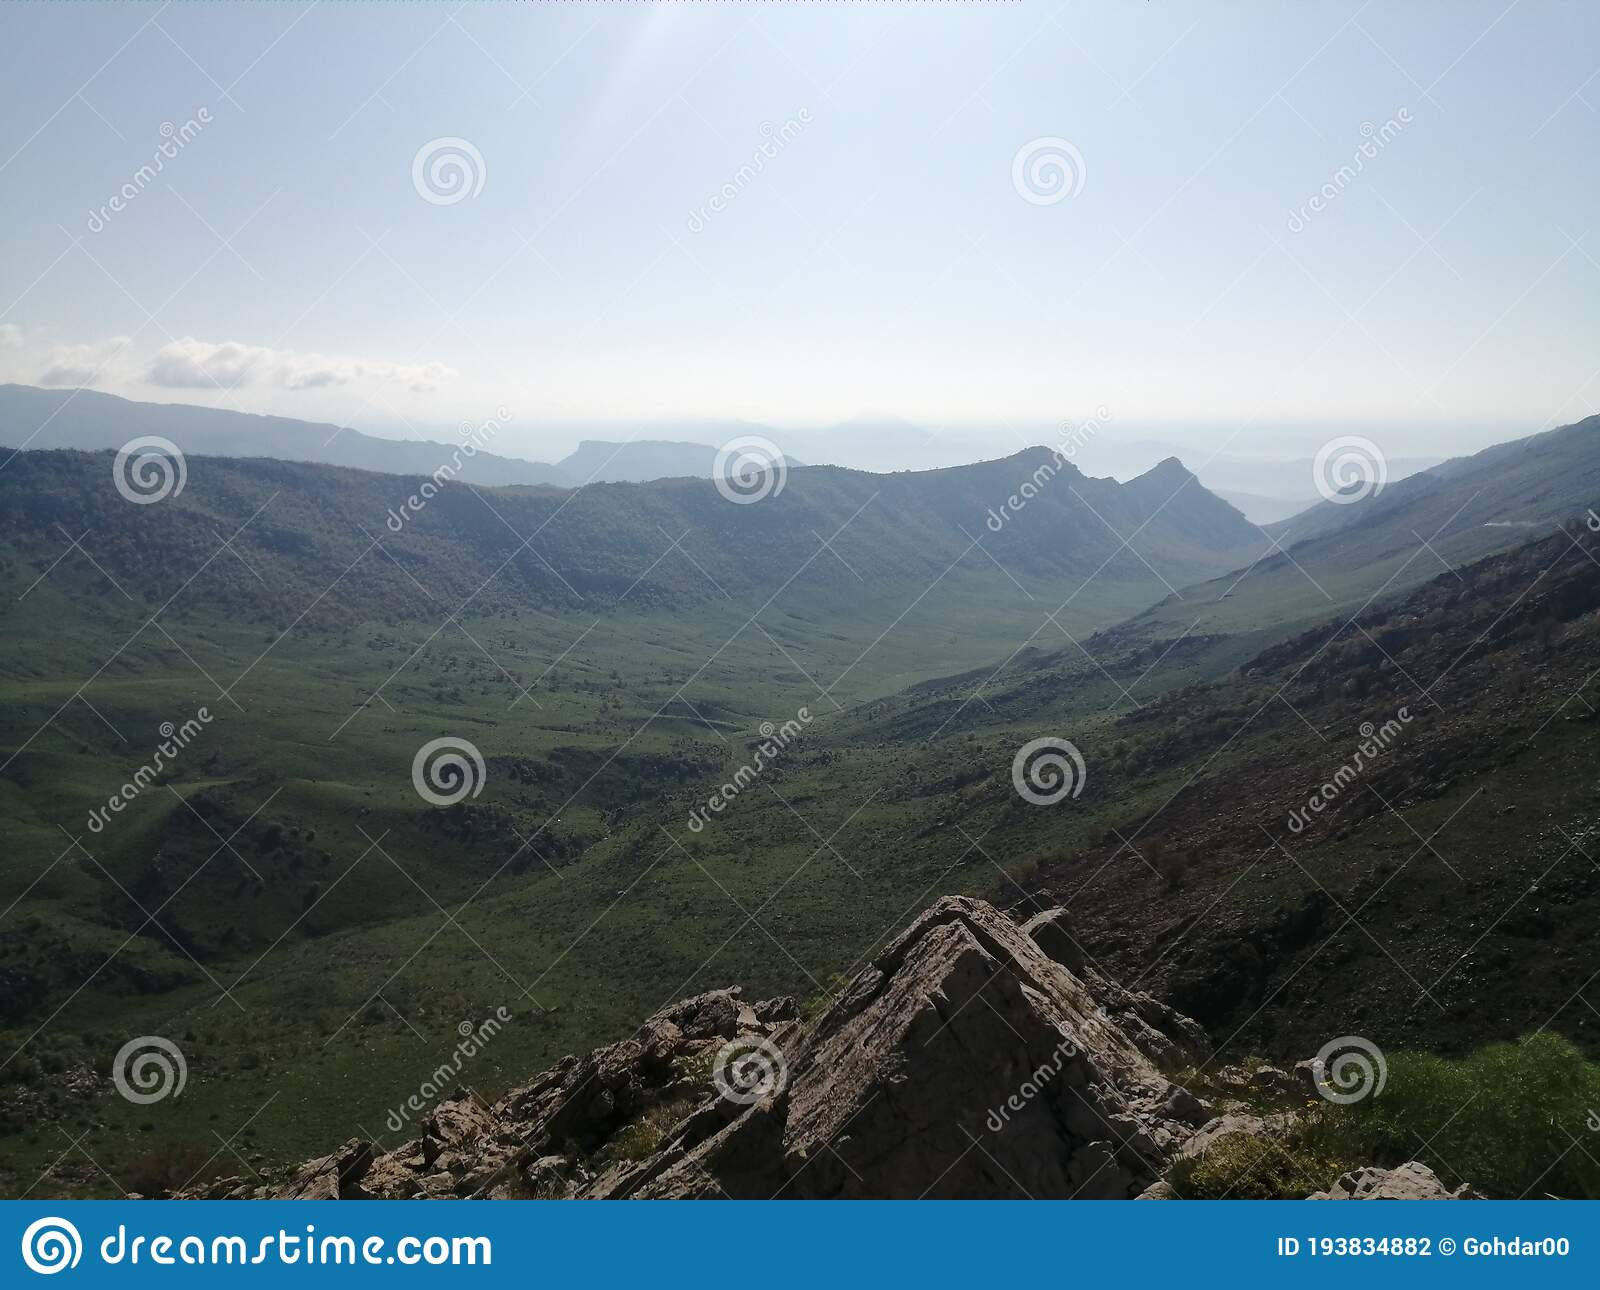 Rain stock photo. Image of mountain, travel, rain, riviera